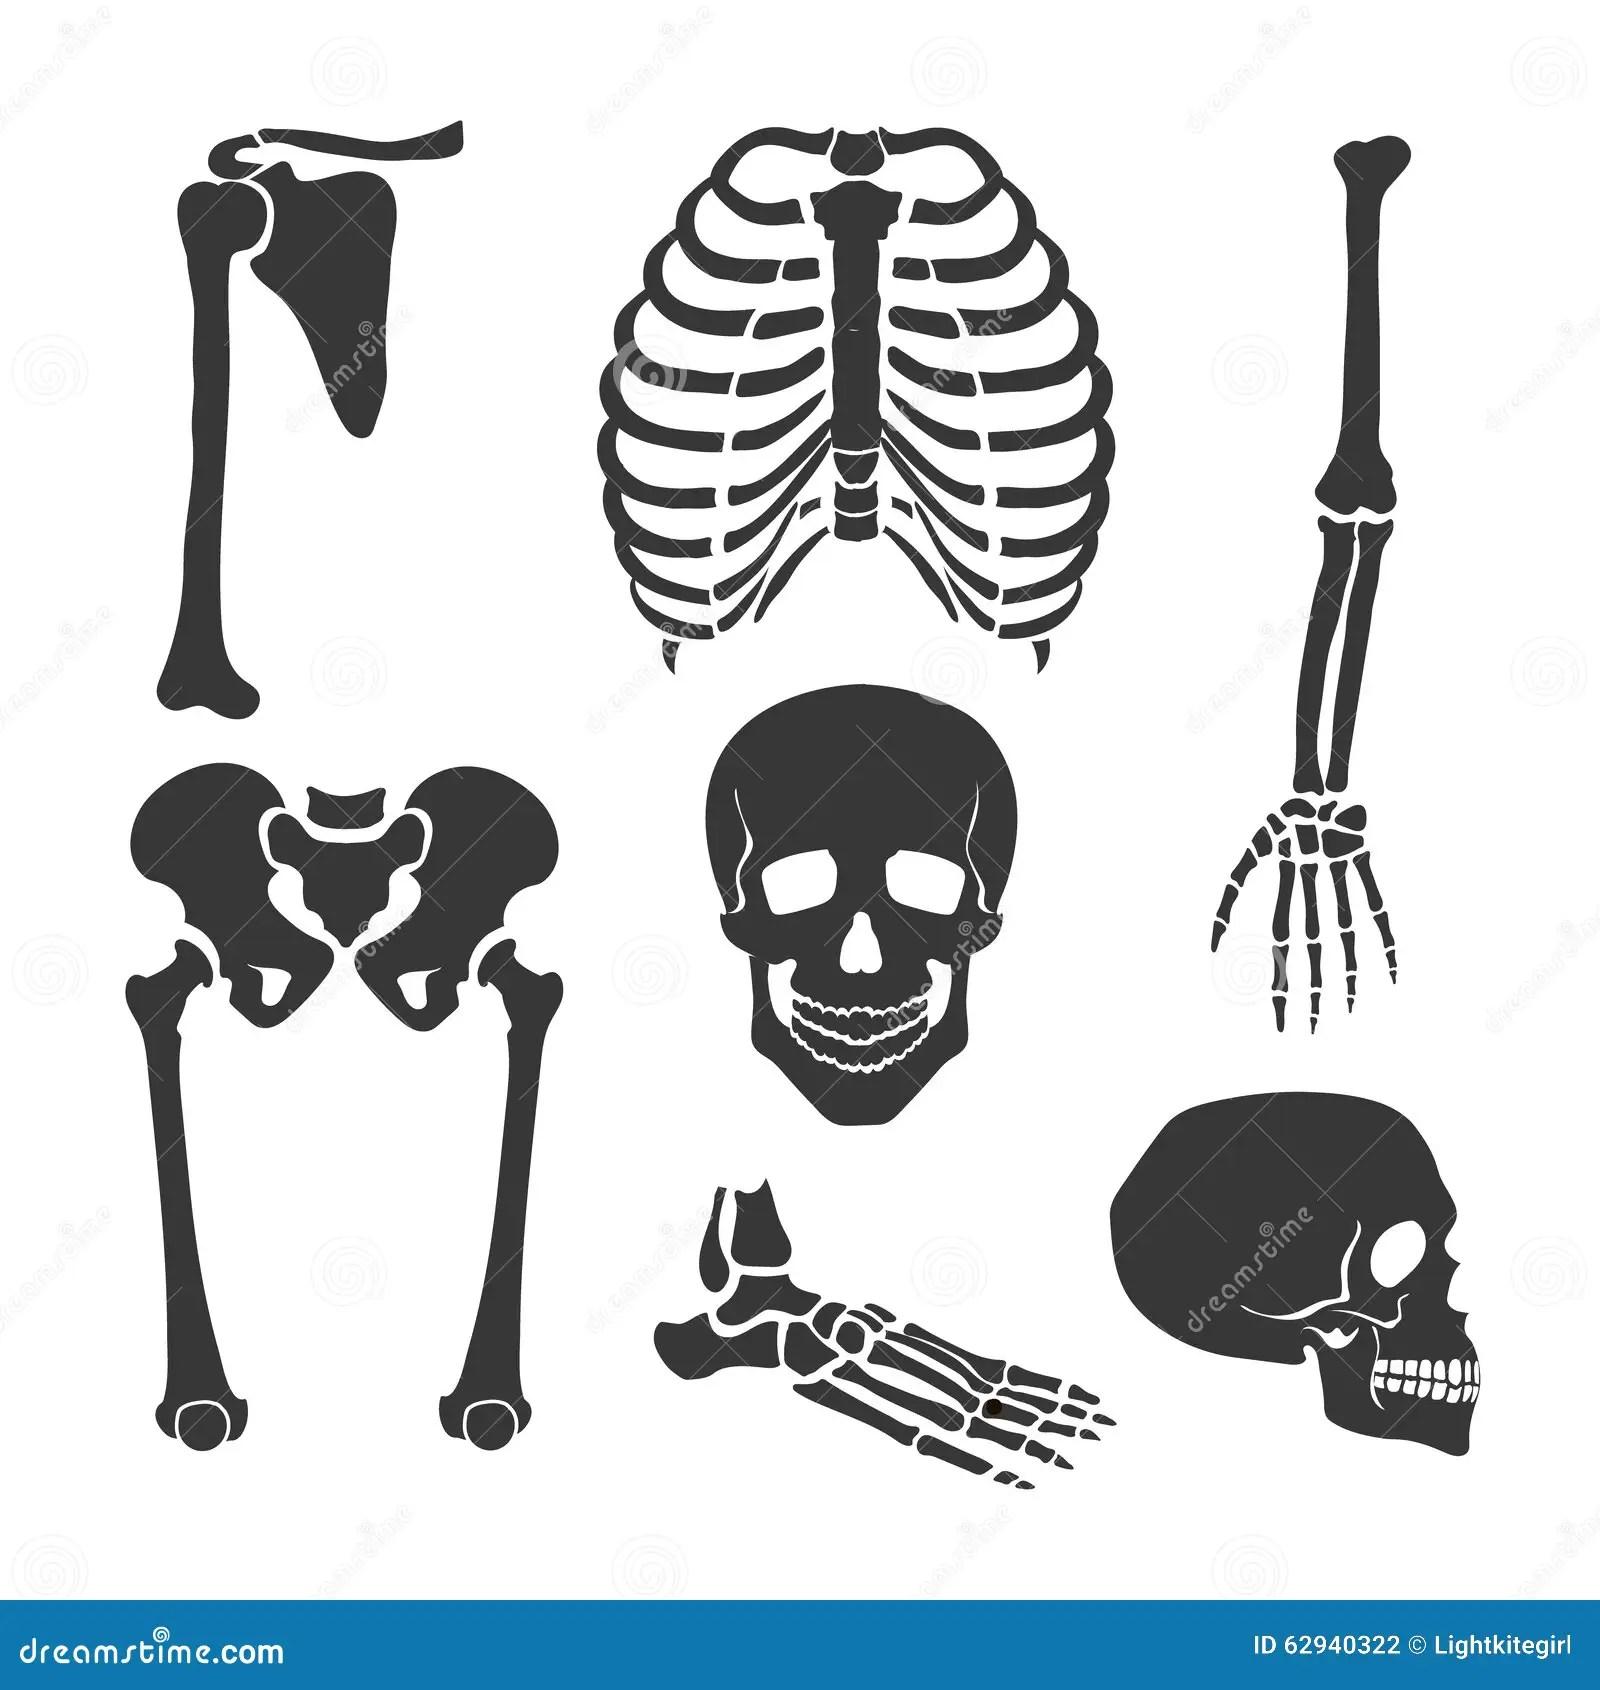 Human Skeleton Vector Black Illustration Set Stock Vector